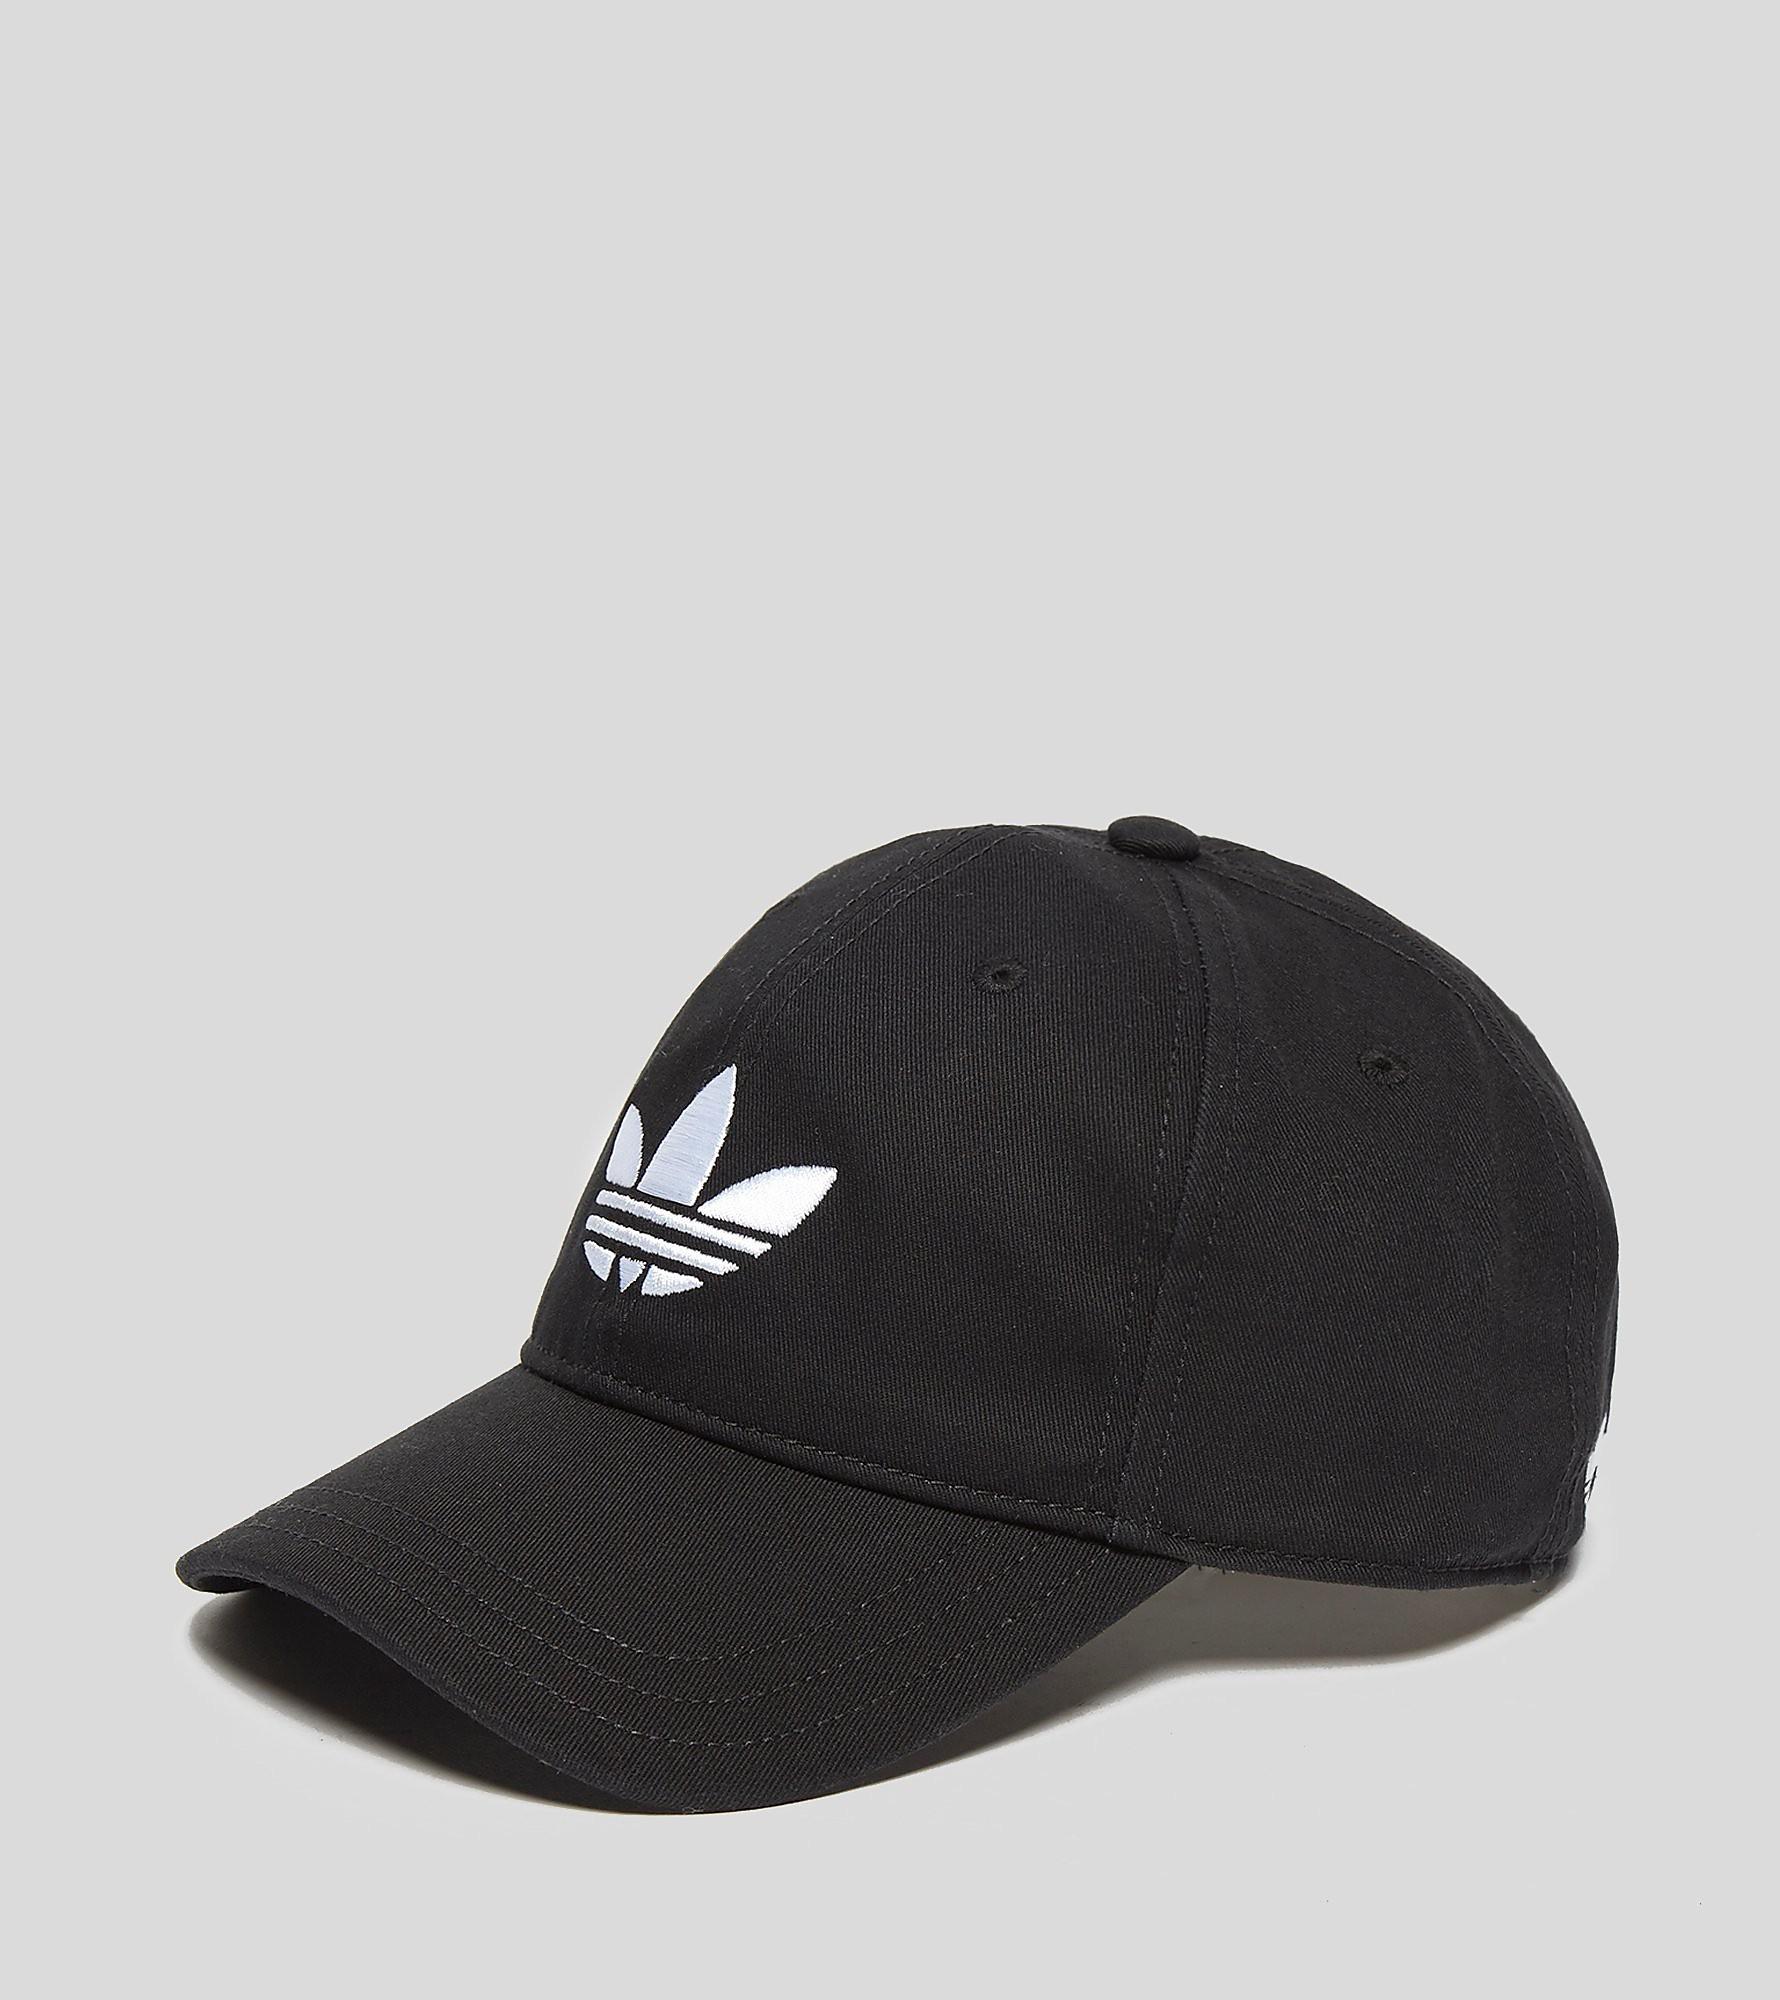 adidas Originals Trefoil Curved Snapback Cap